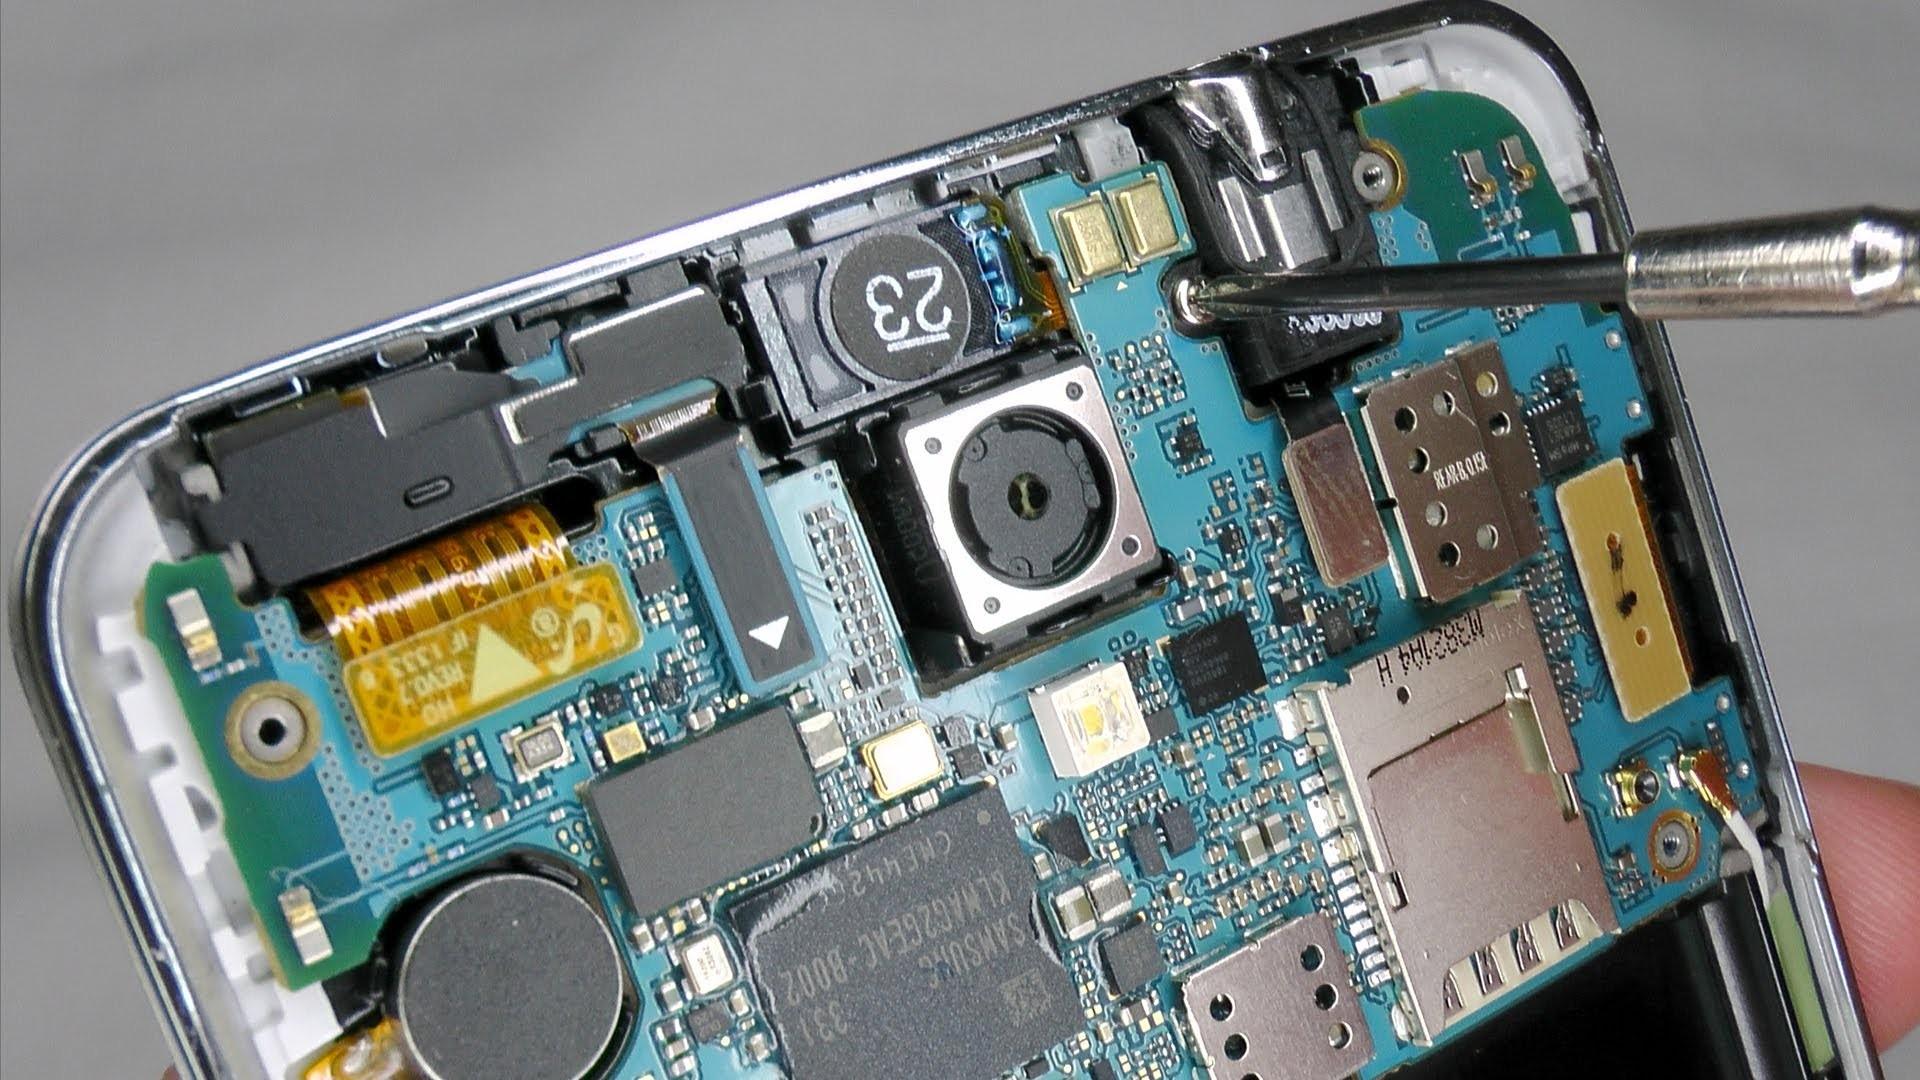 Sửa lỗi nguồn - Thay ic nguồn Galaxy Note 3